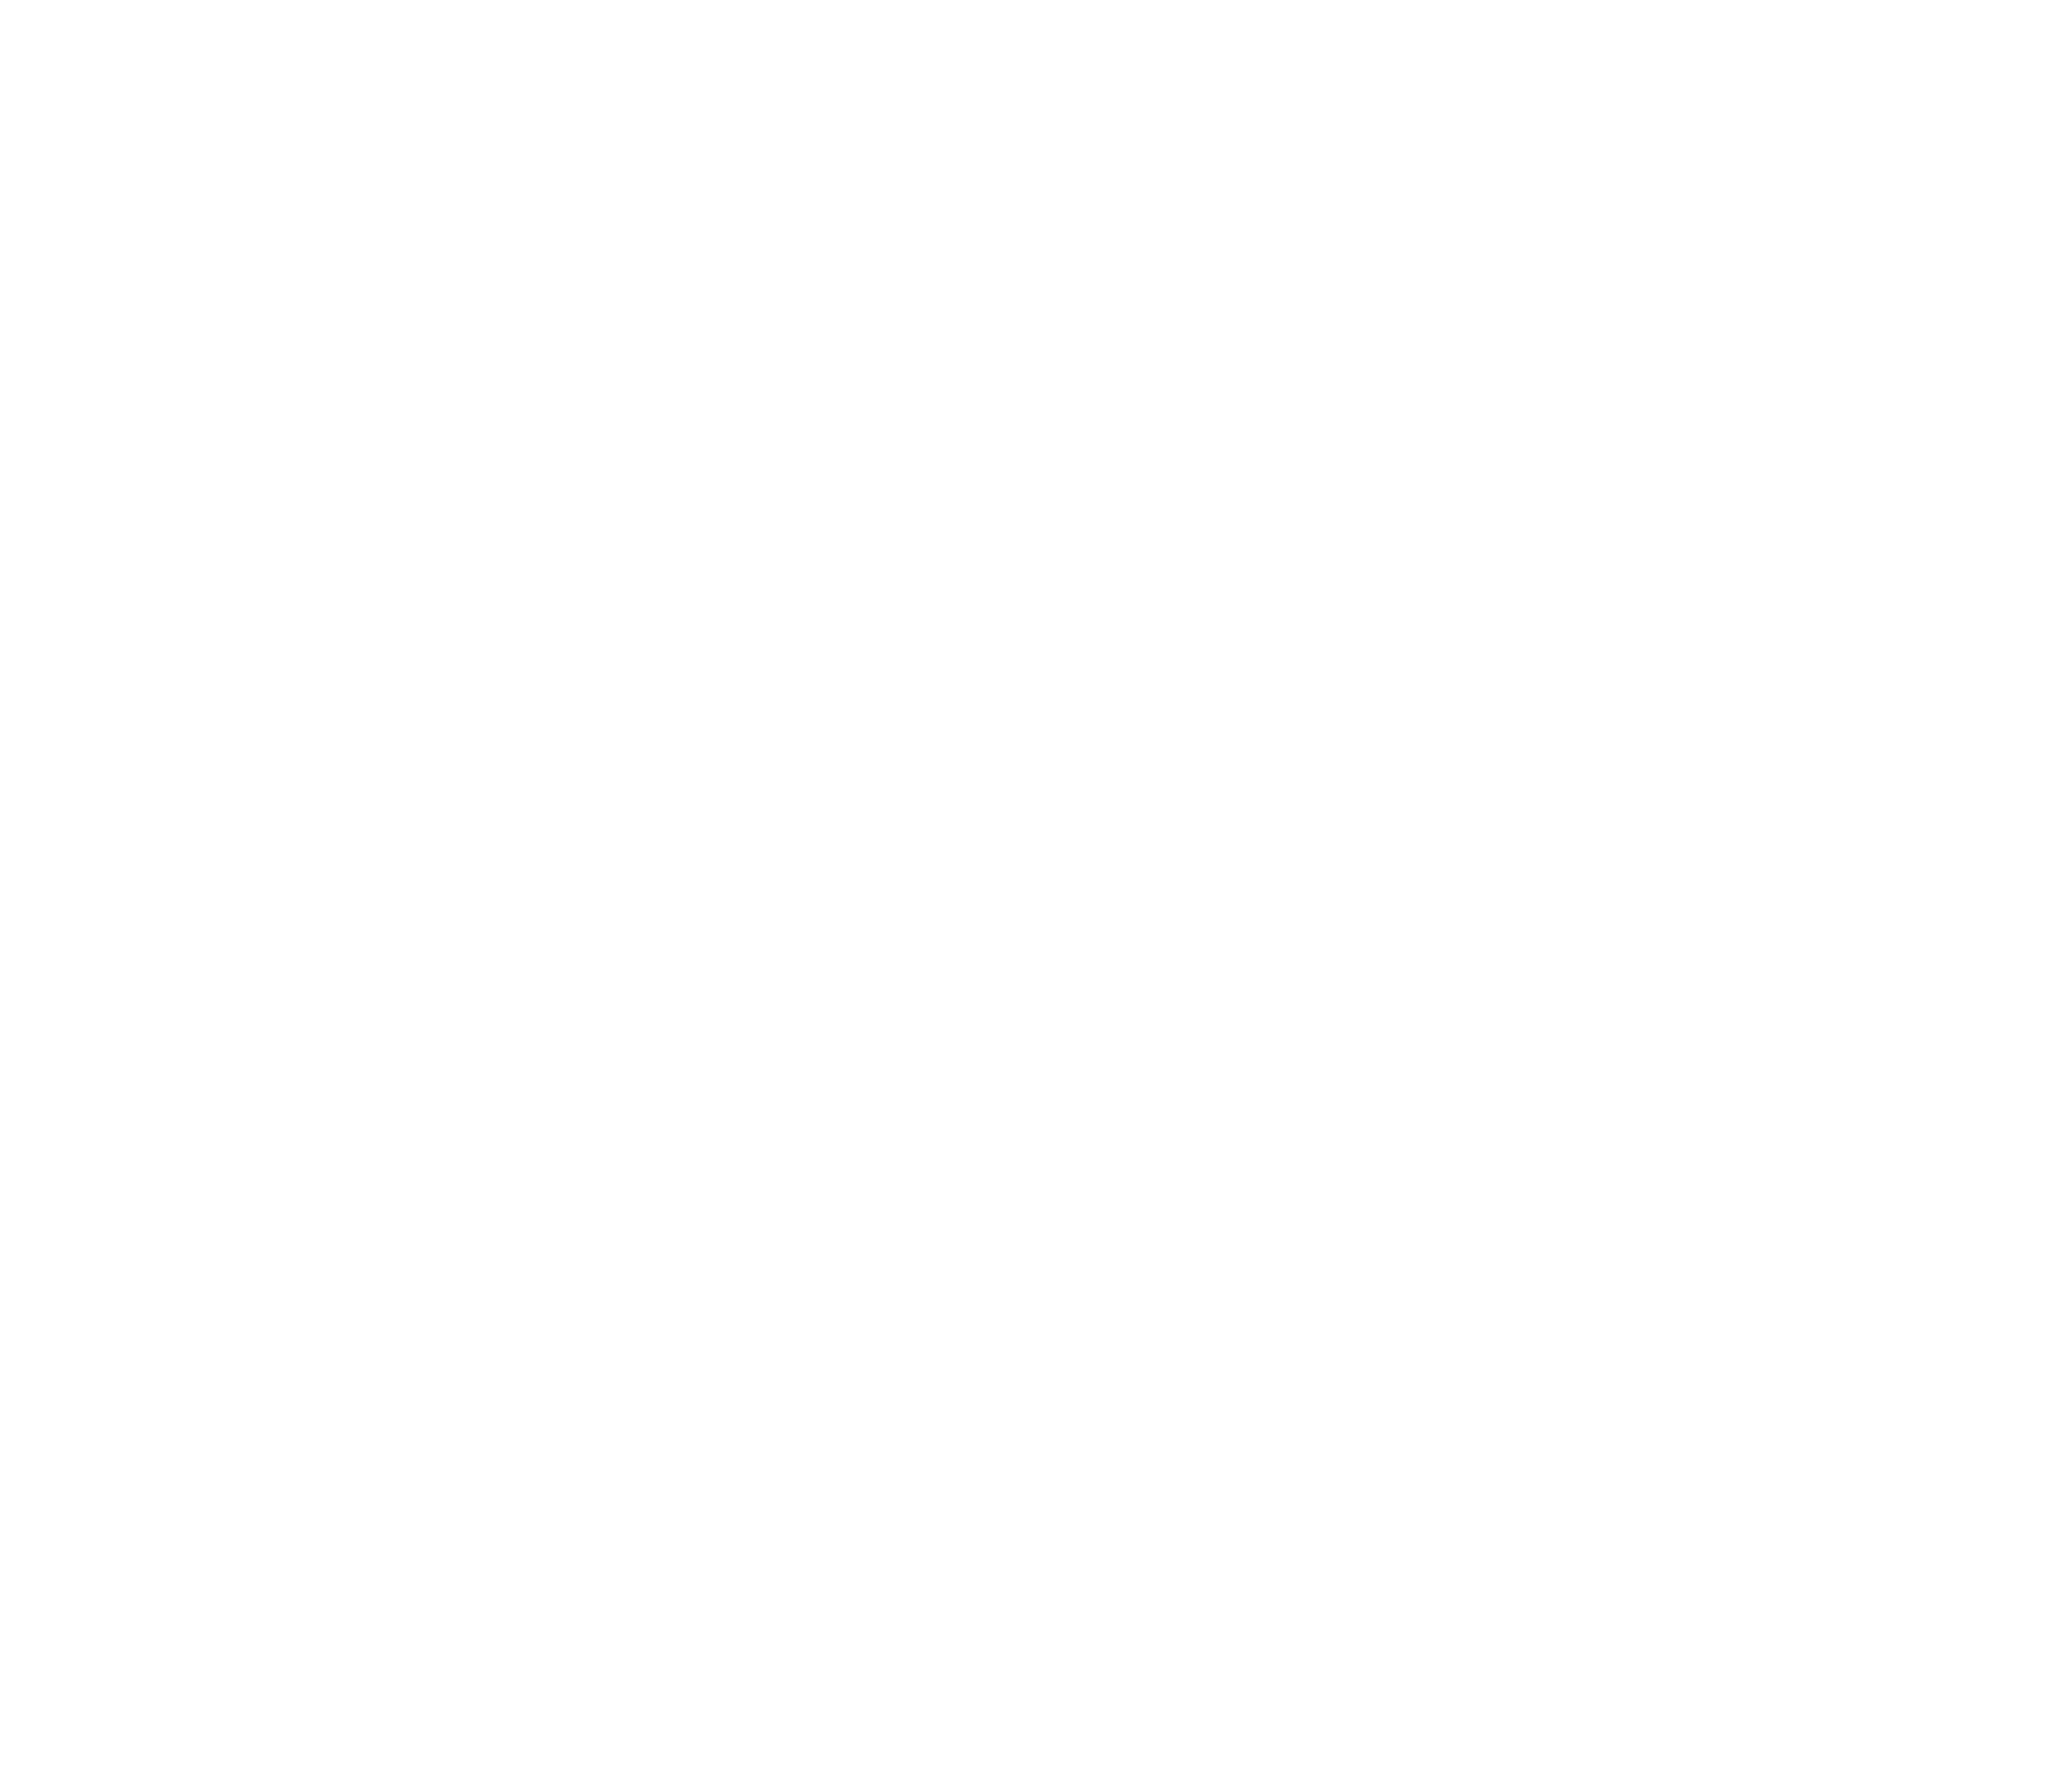 Partners & Advisers